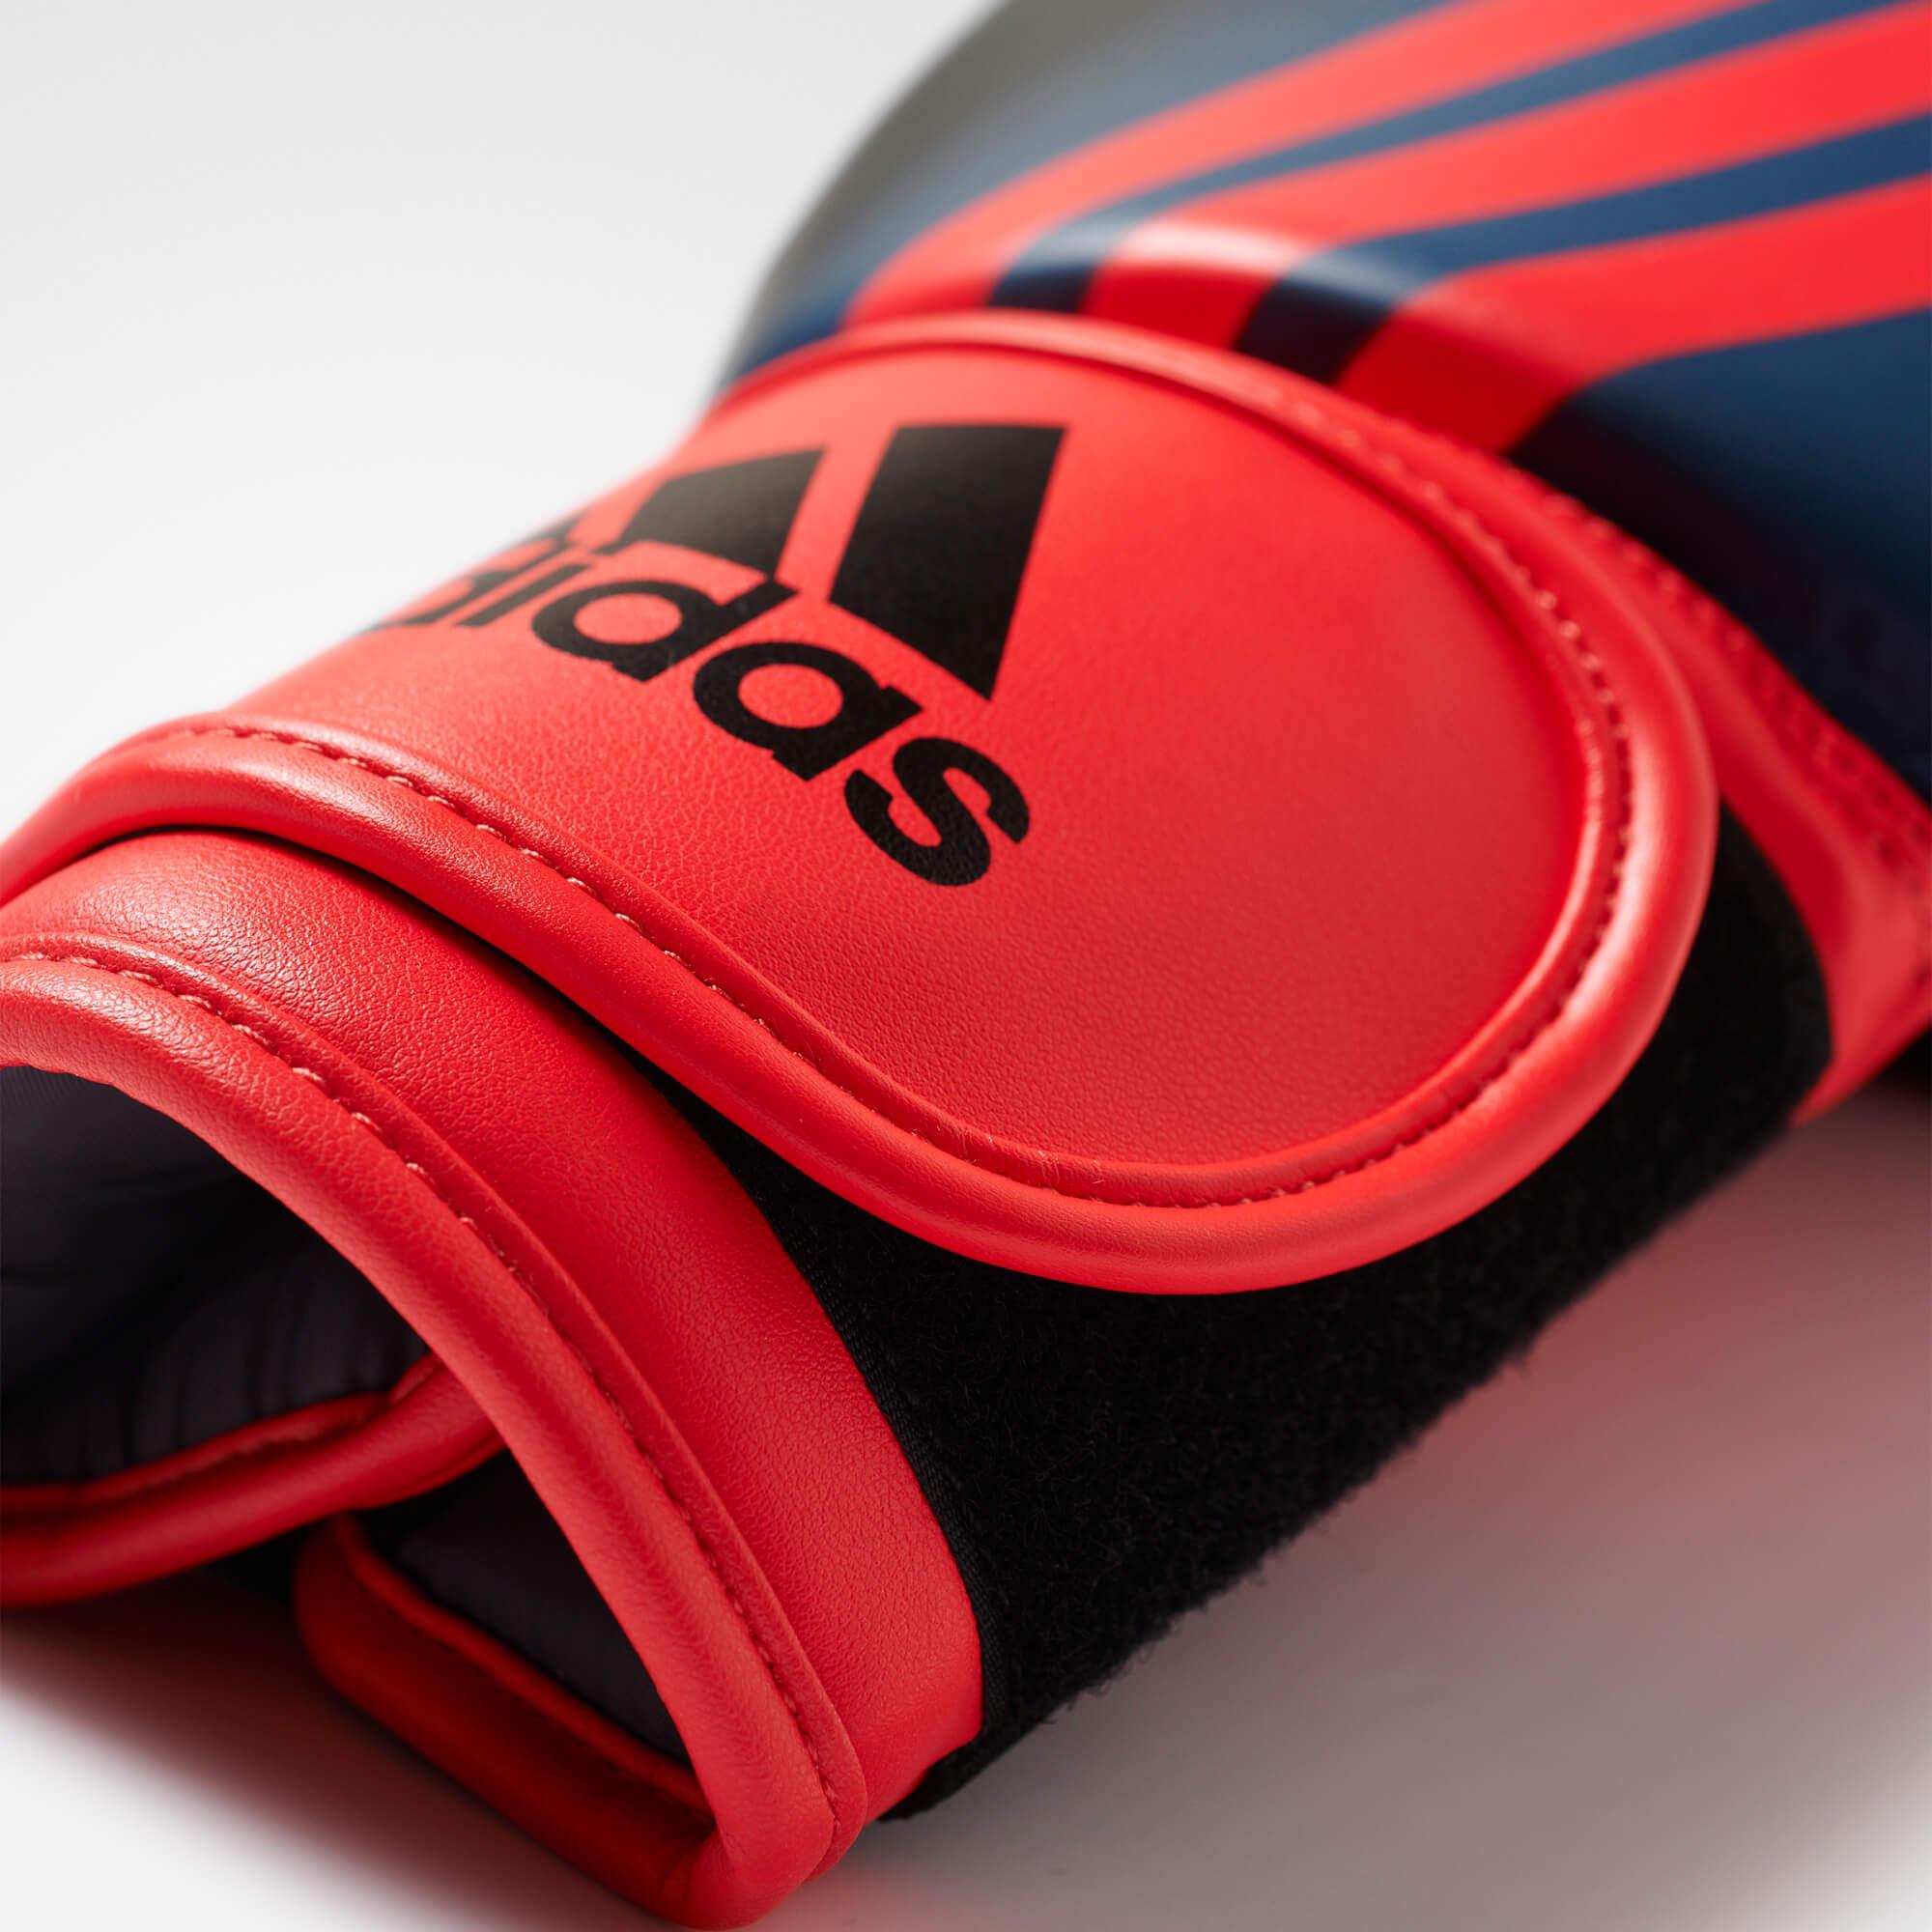 adidas Damen Boxhandschuhe Speed Women 100, blackshock red, ADISBGW100